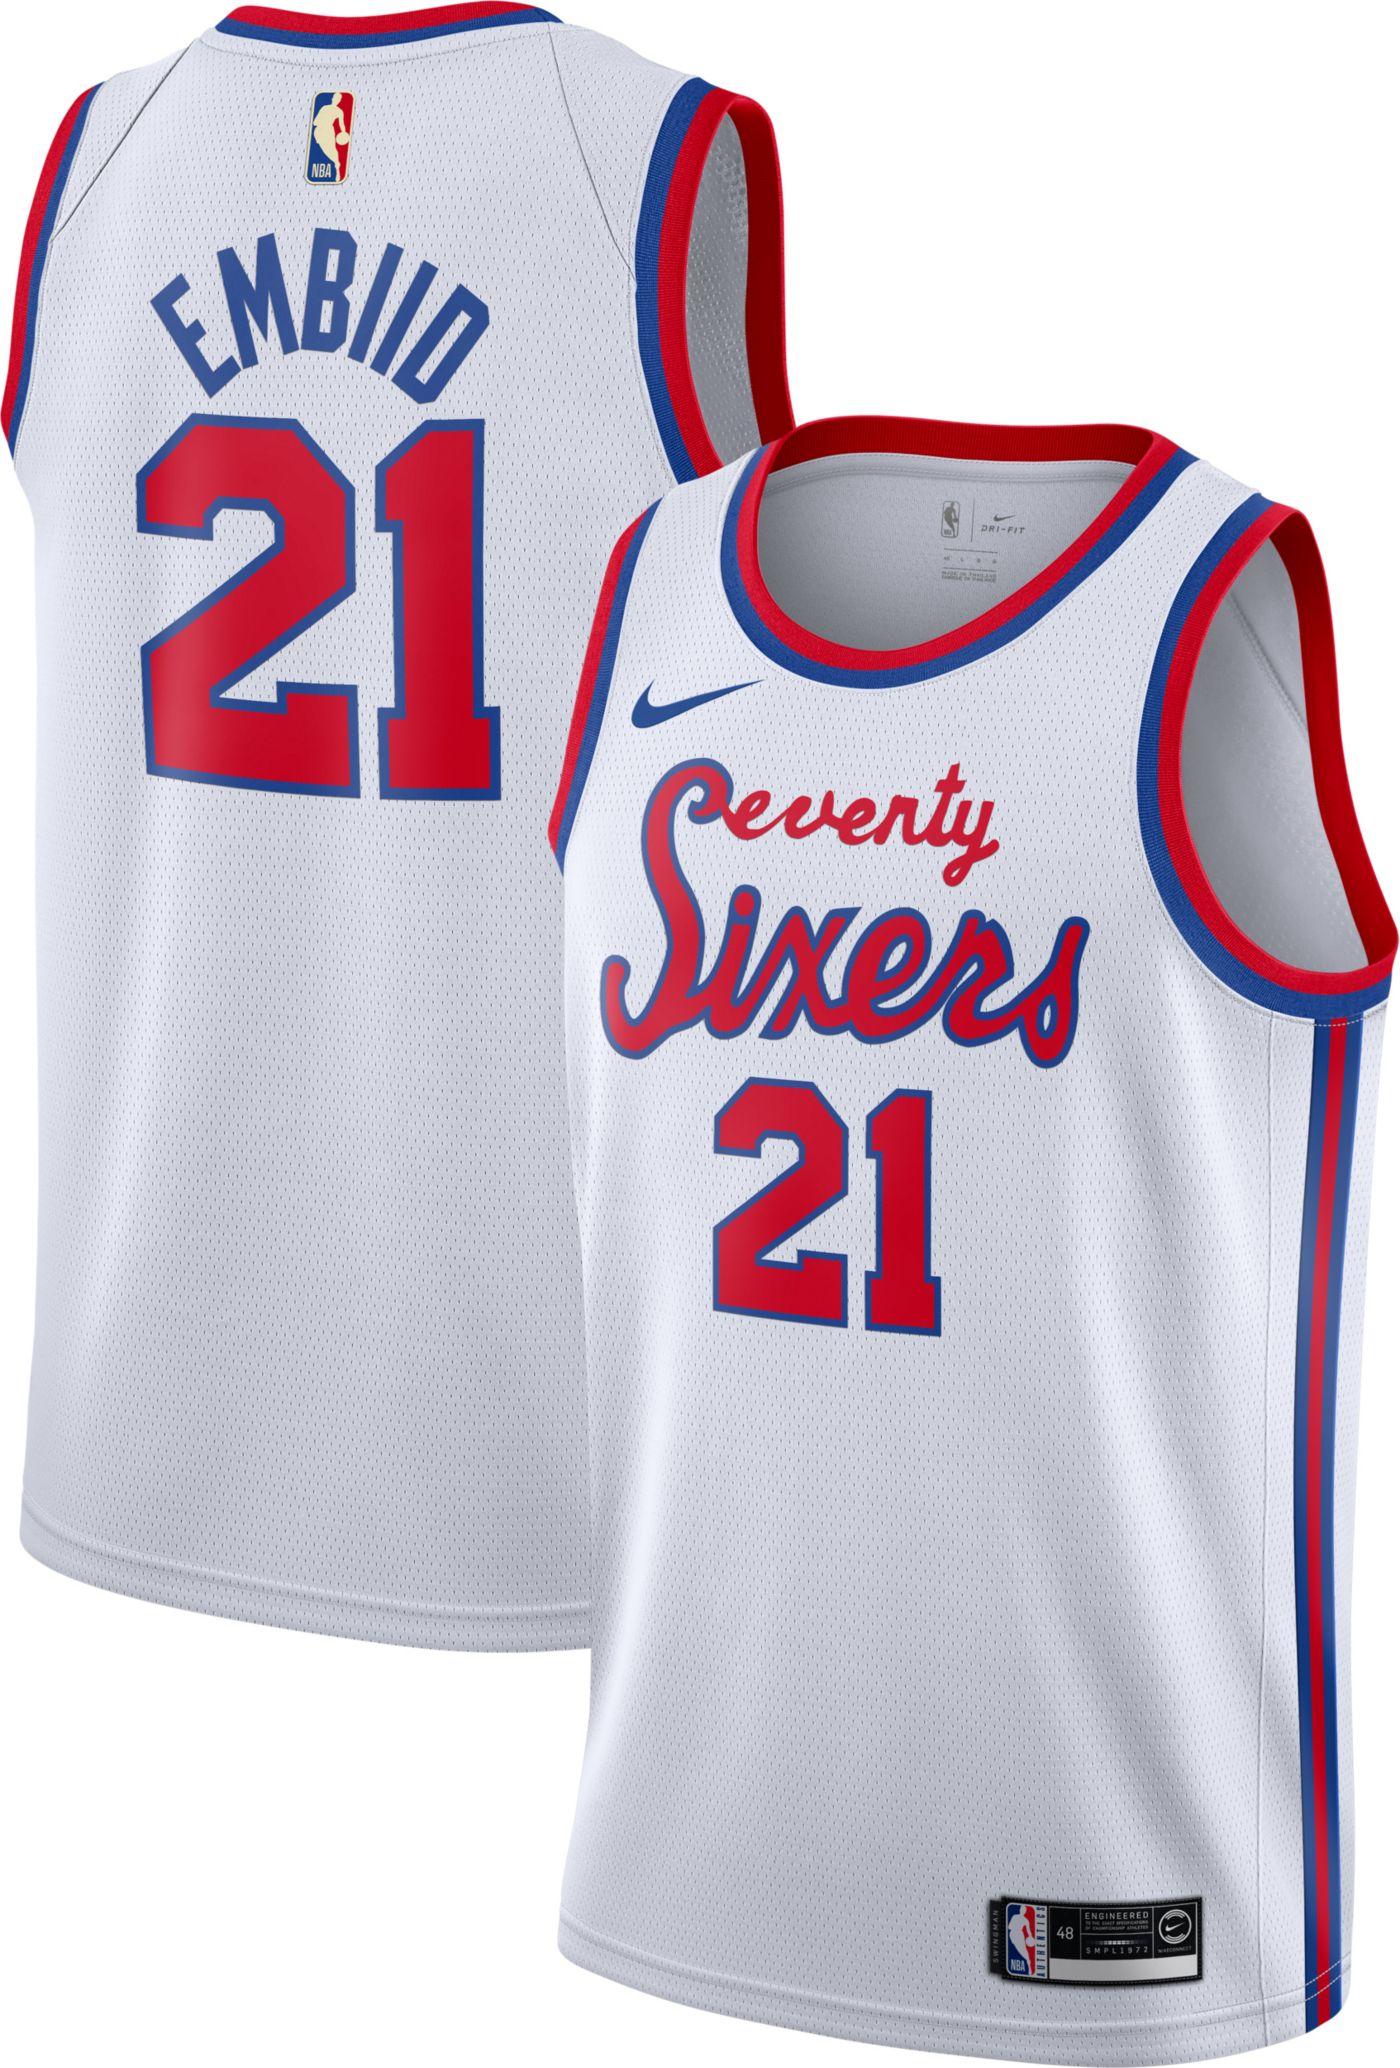 Nike Men's Philadelphia 76ers Joel Embiid #21 Hardwood Classic Dri-FIT Swingman Jersey